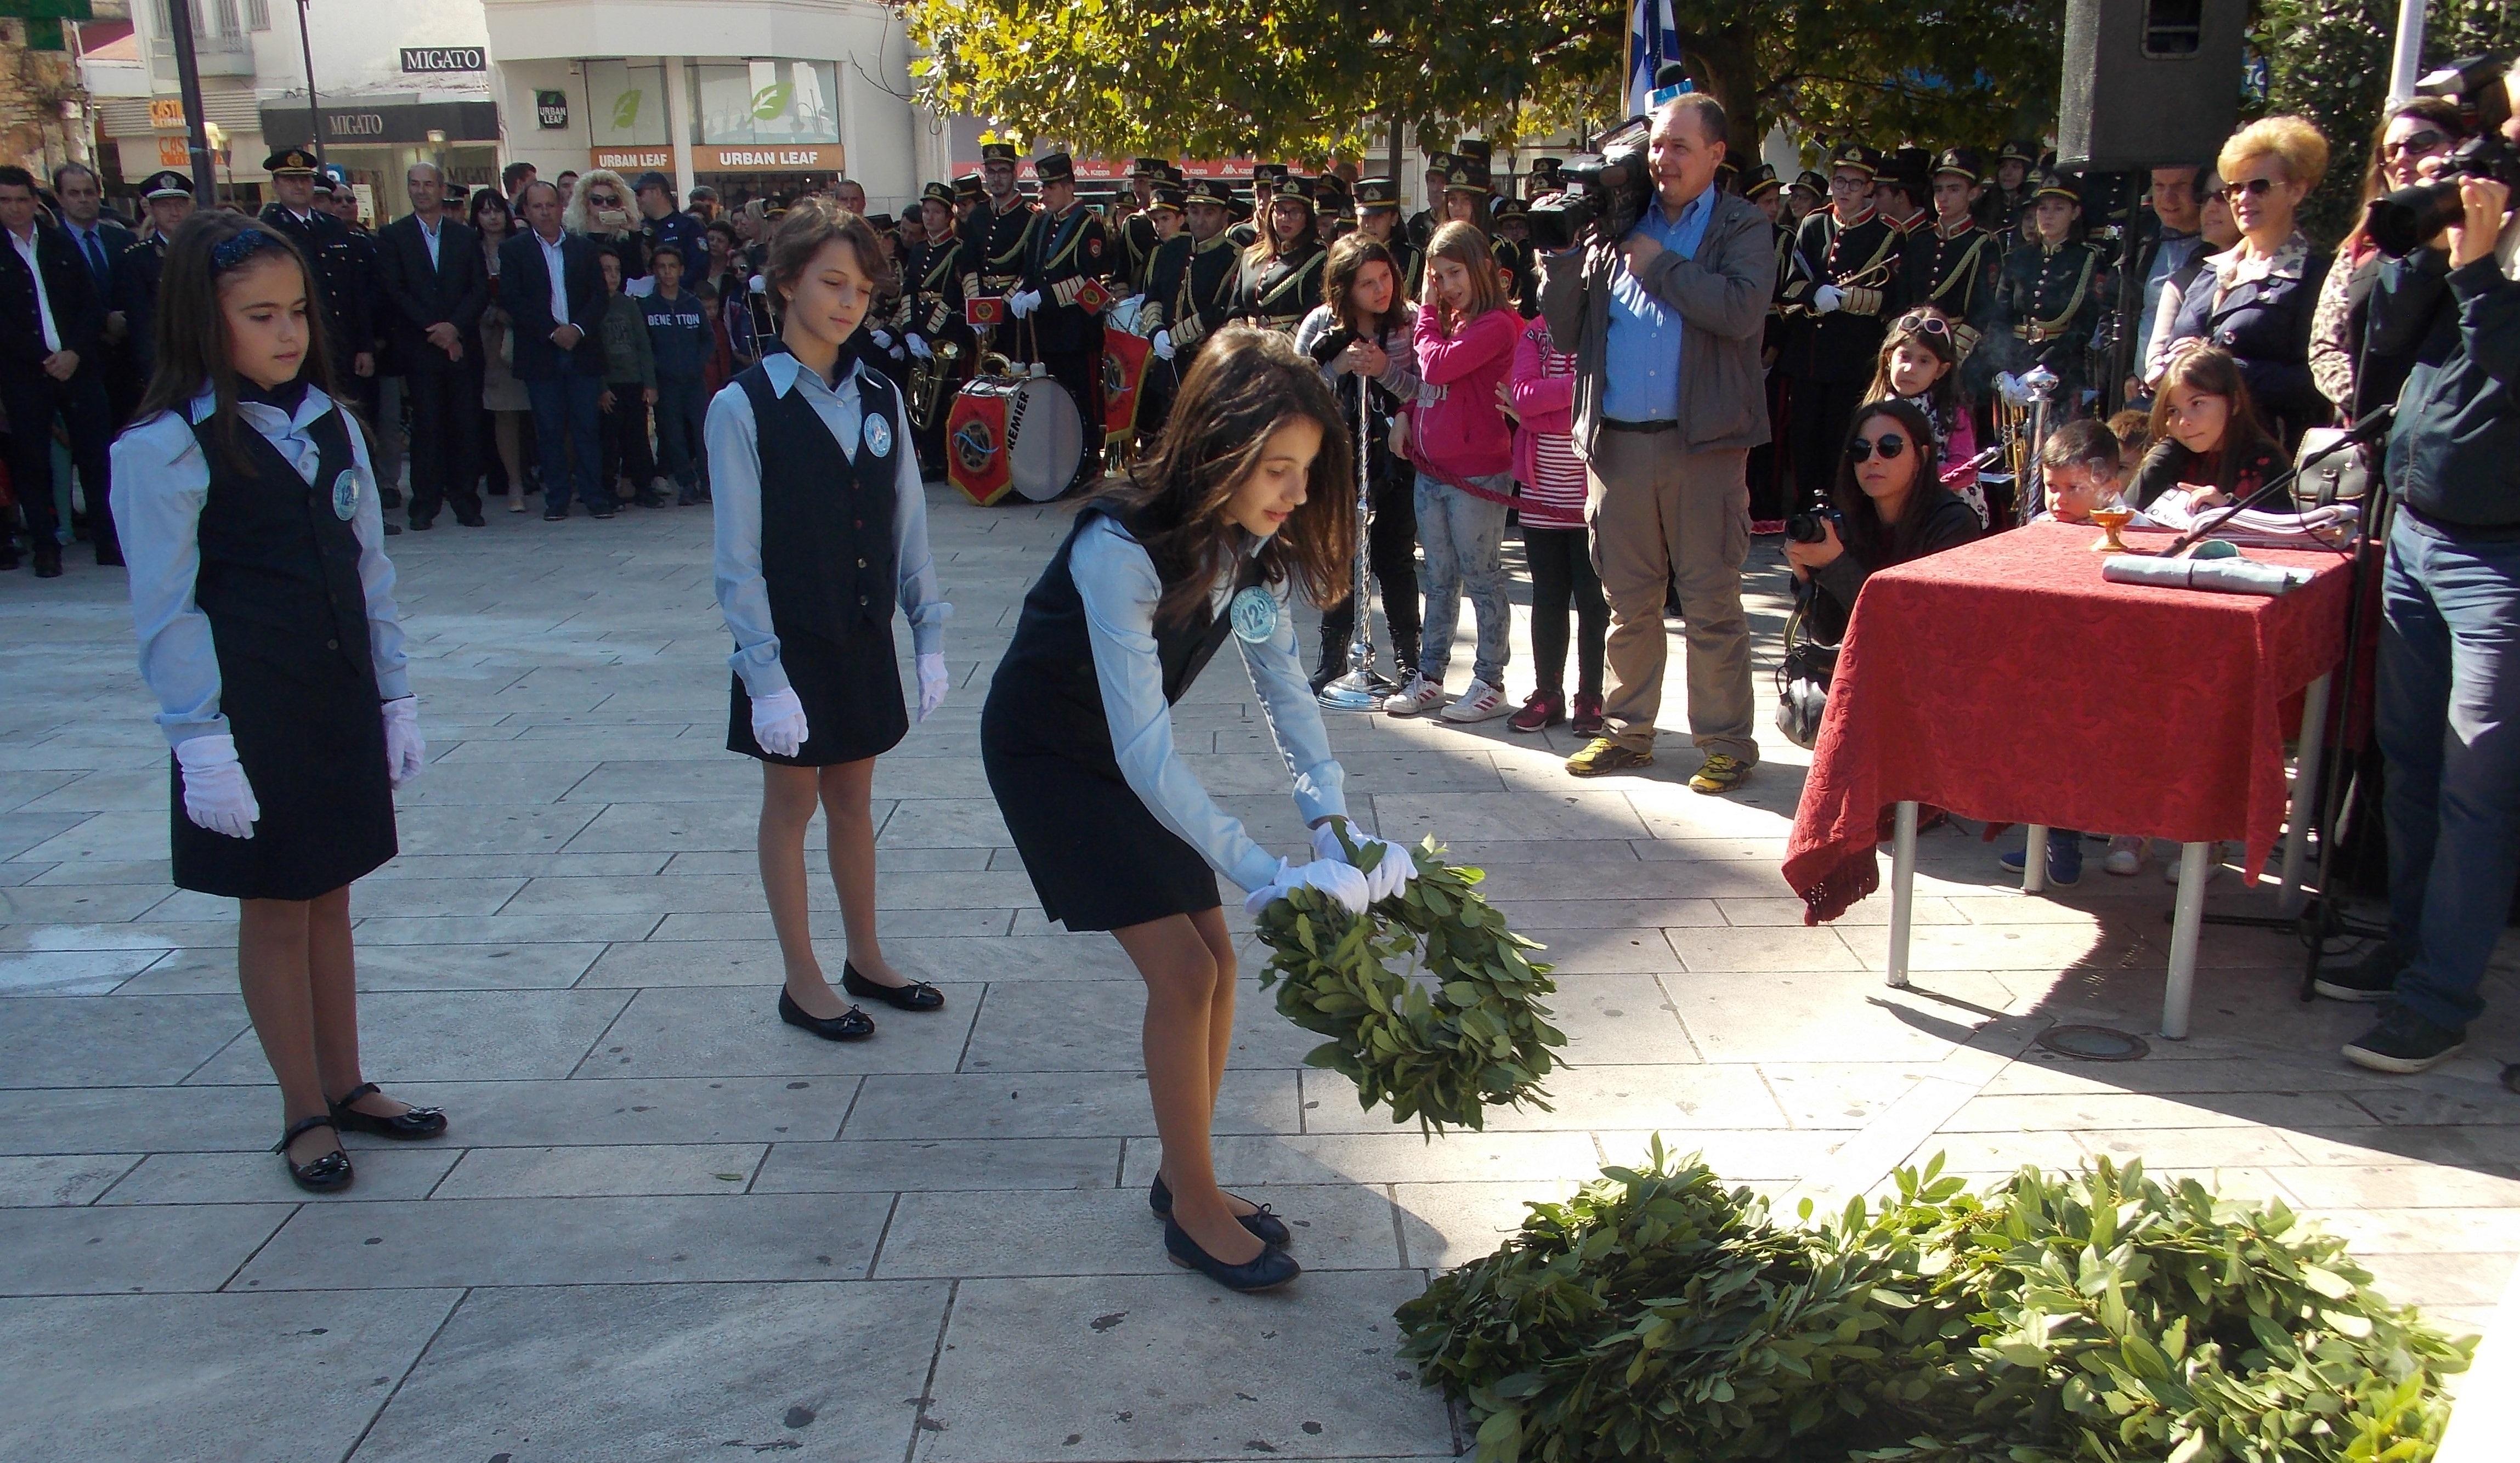 Aγρίνιο: οι μαθητές τιμούν τους Ήρωες του Έπους του ΄40 (φωτό)